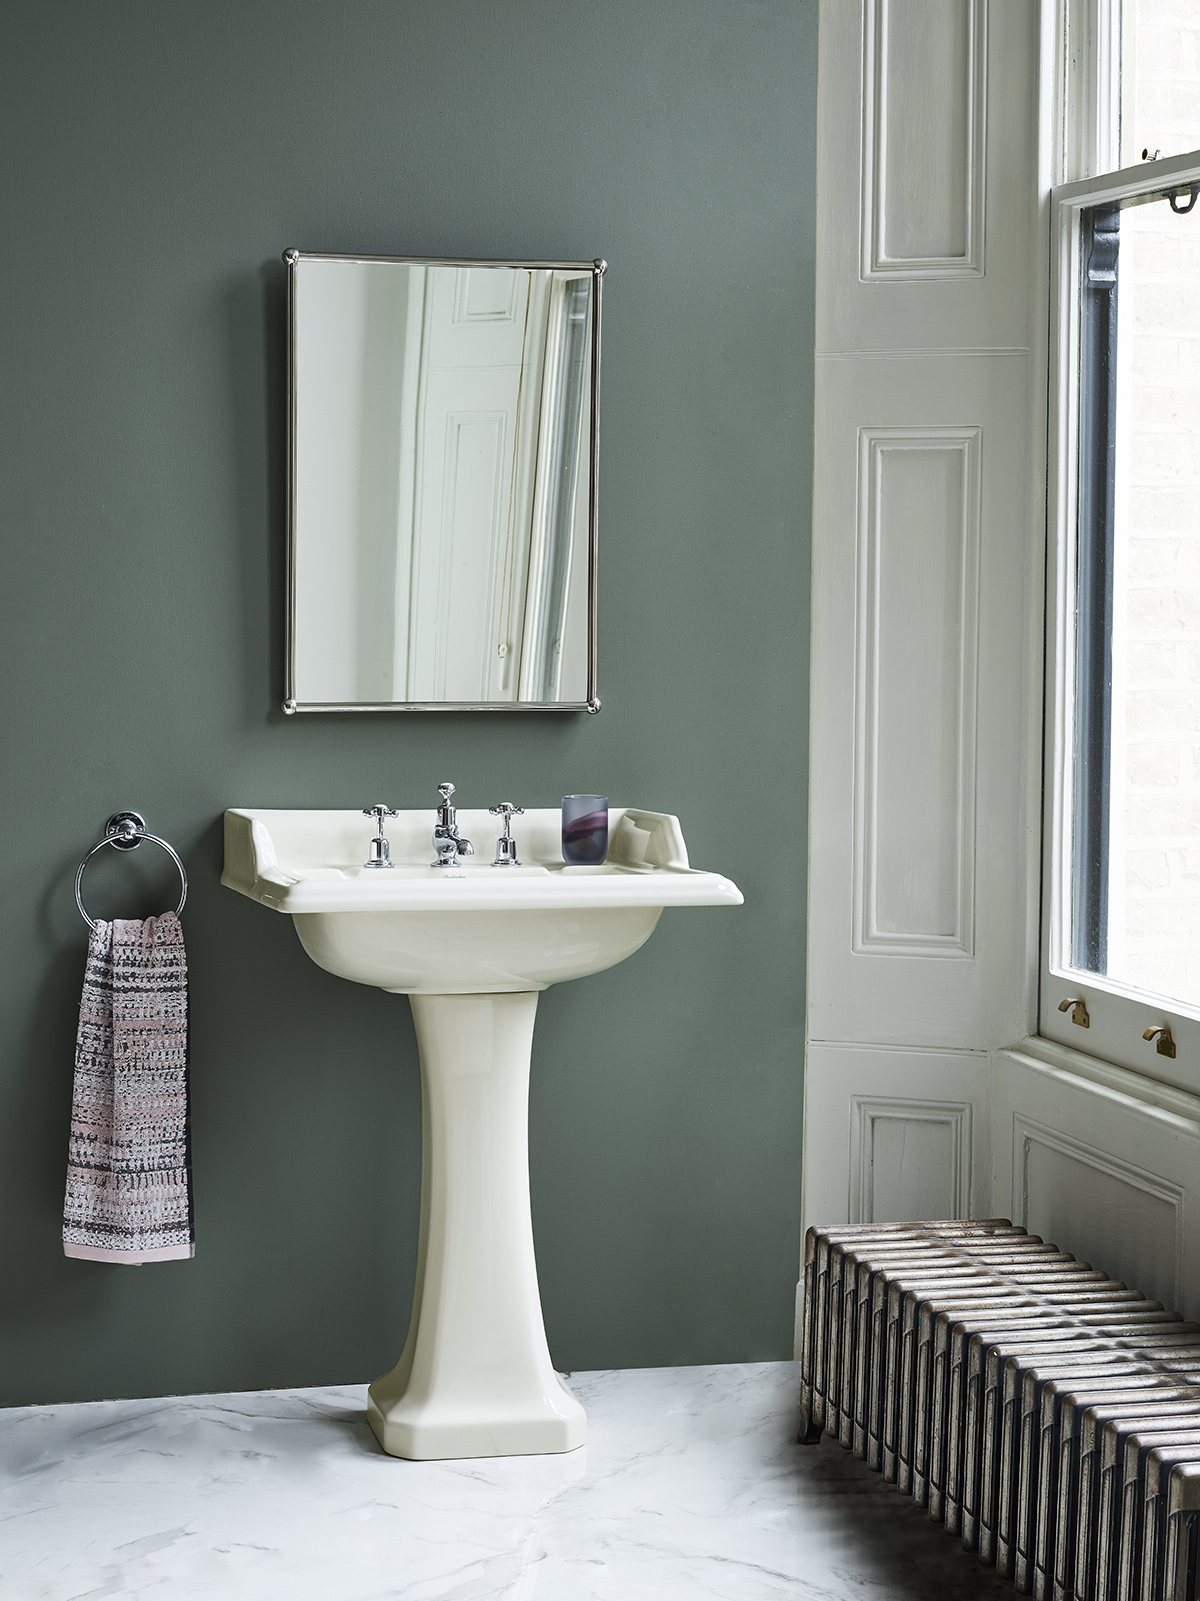 Medici ivory ceramic basin - Burlington Bathrooms 1200px 2.jpg